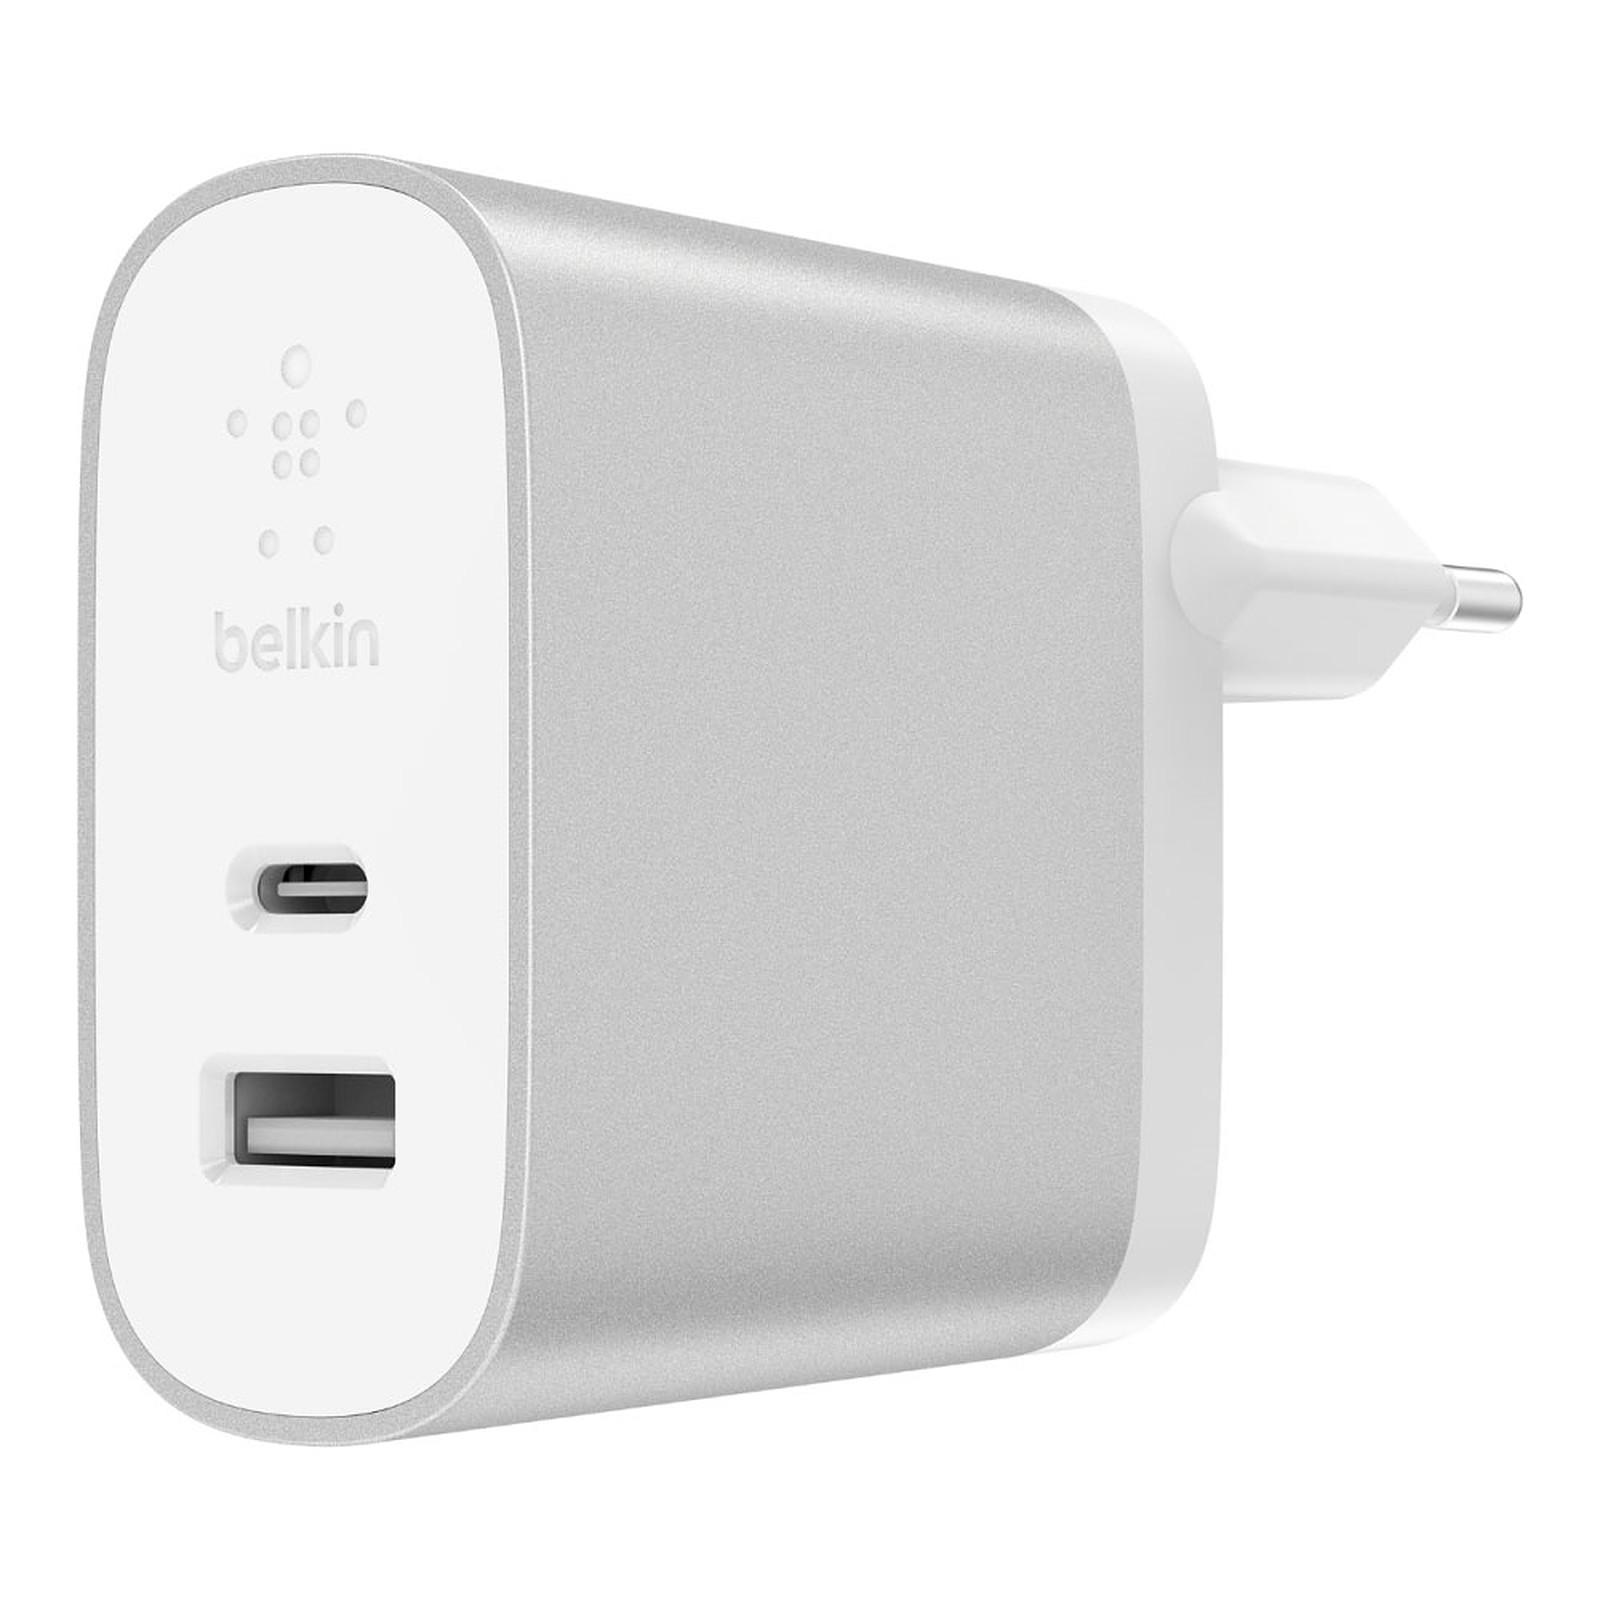 Belkin Chargeur Secteur Boost Charge USB-C/USB-A (F7U061VF-SLV)